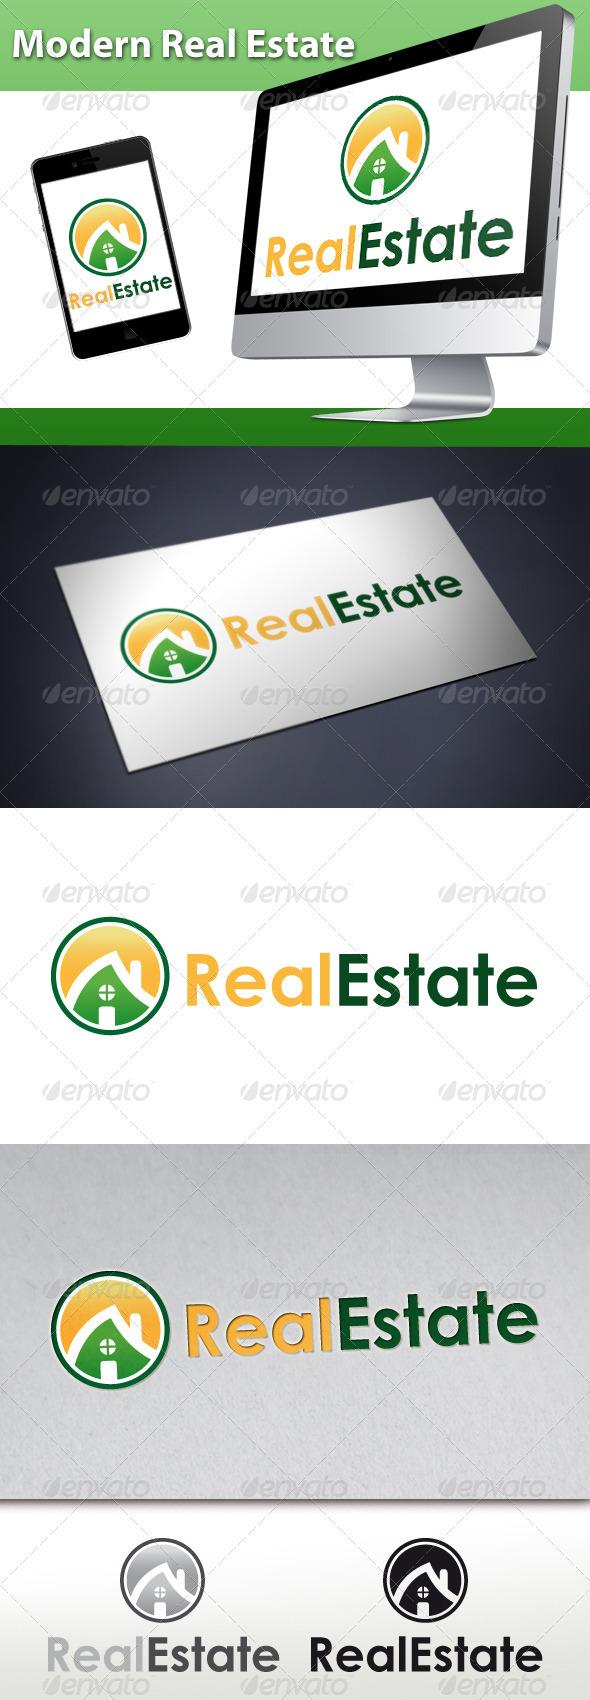 GraphicRiver Modern Real Estate Logo 1 3386062